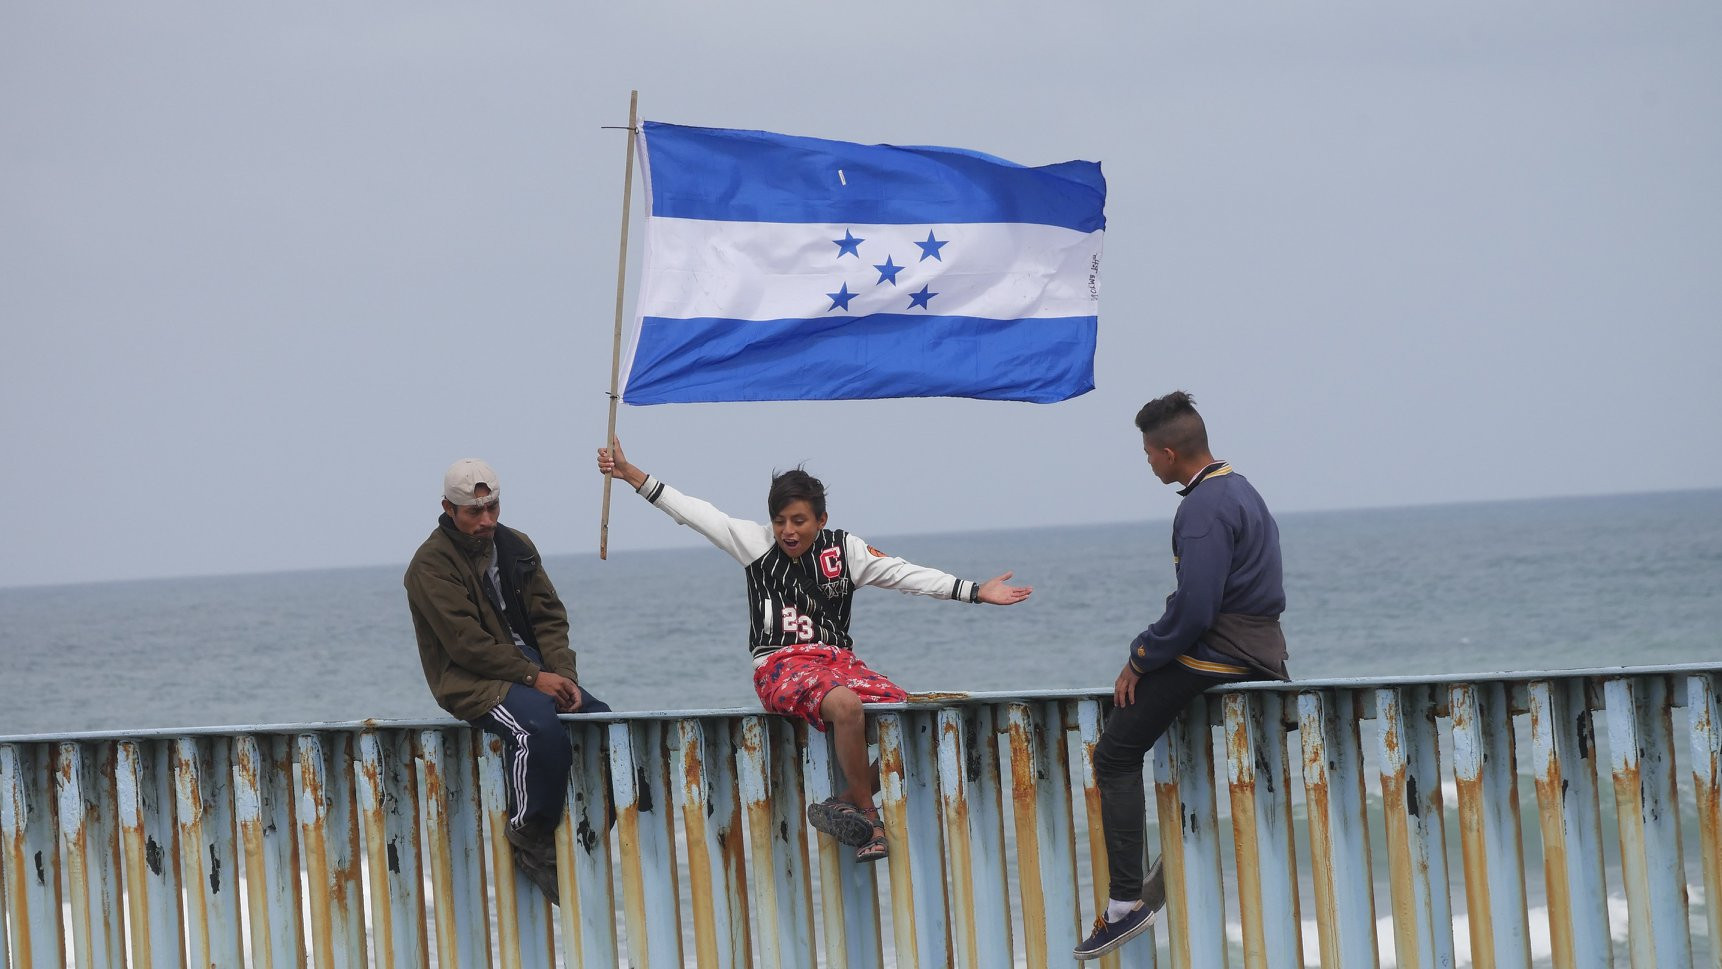 Child part of migrant caravan on border wall waving Hondurus flag